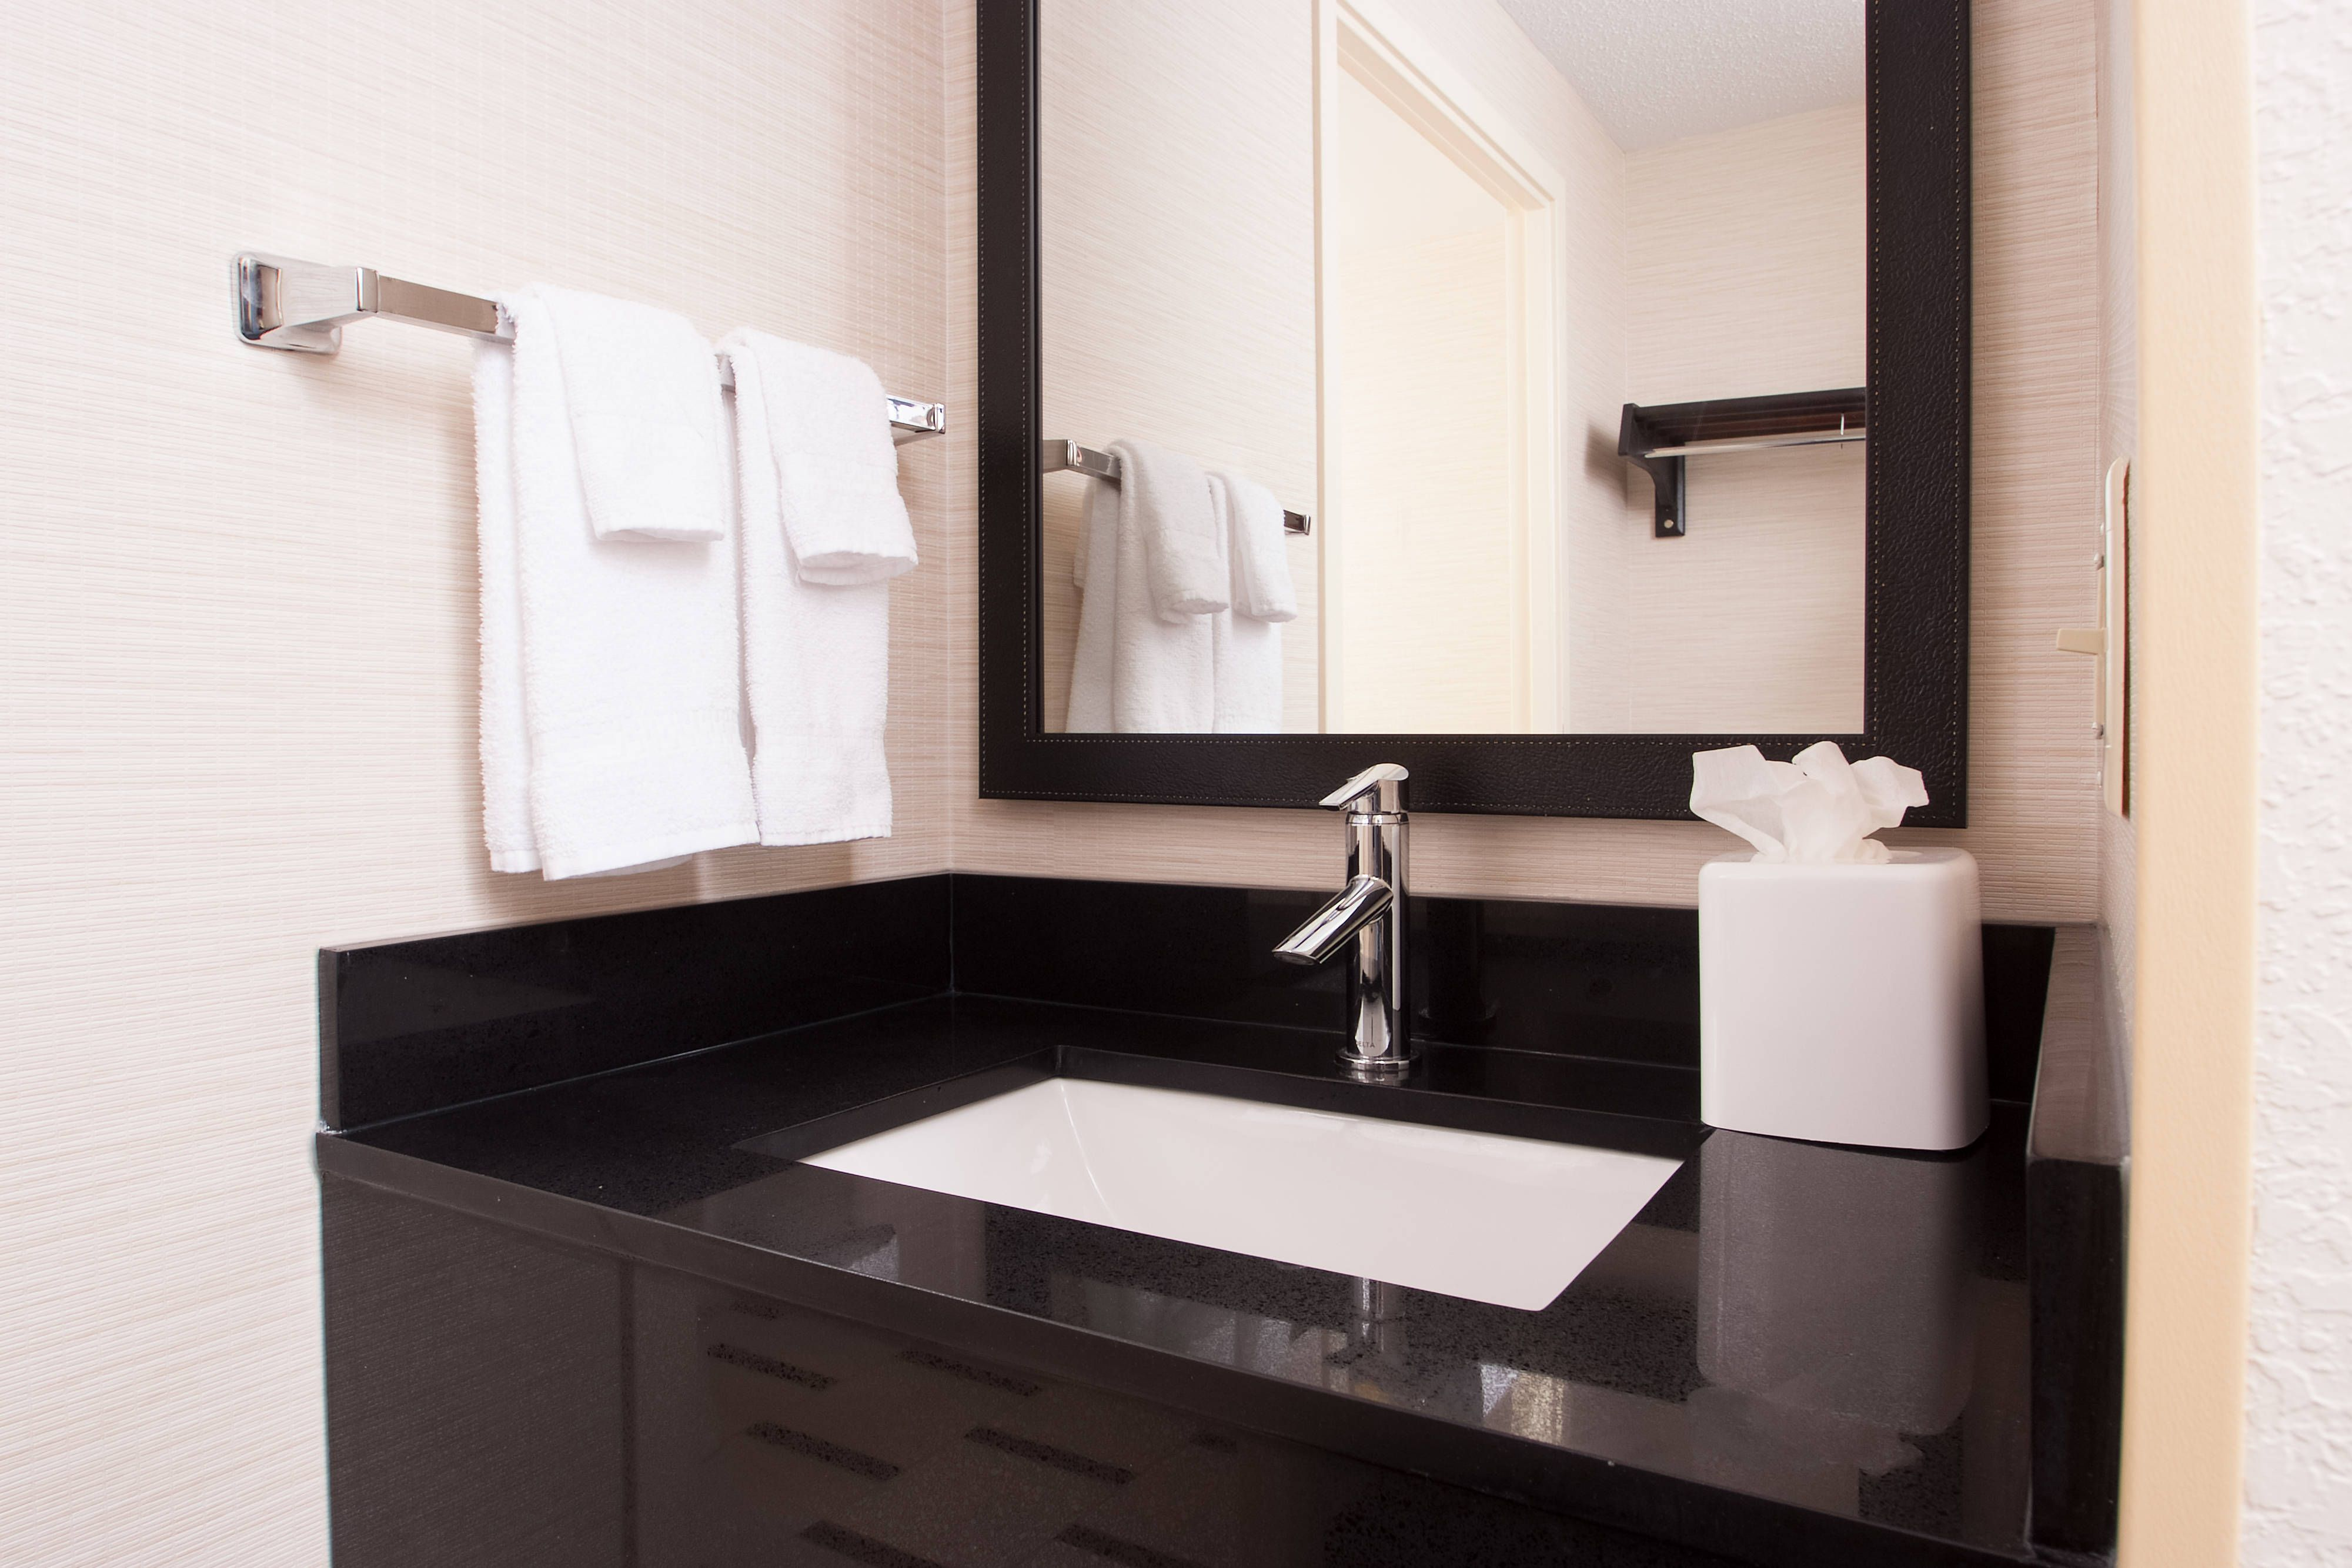 Fairfield Inn Greenville Spartanburg Airport Guest Bathroom Vanity